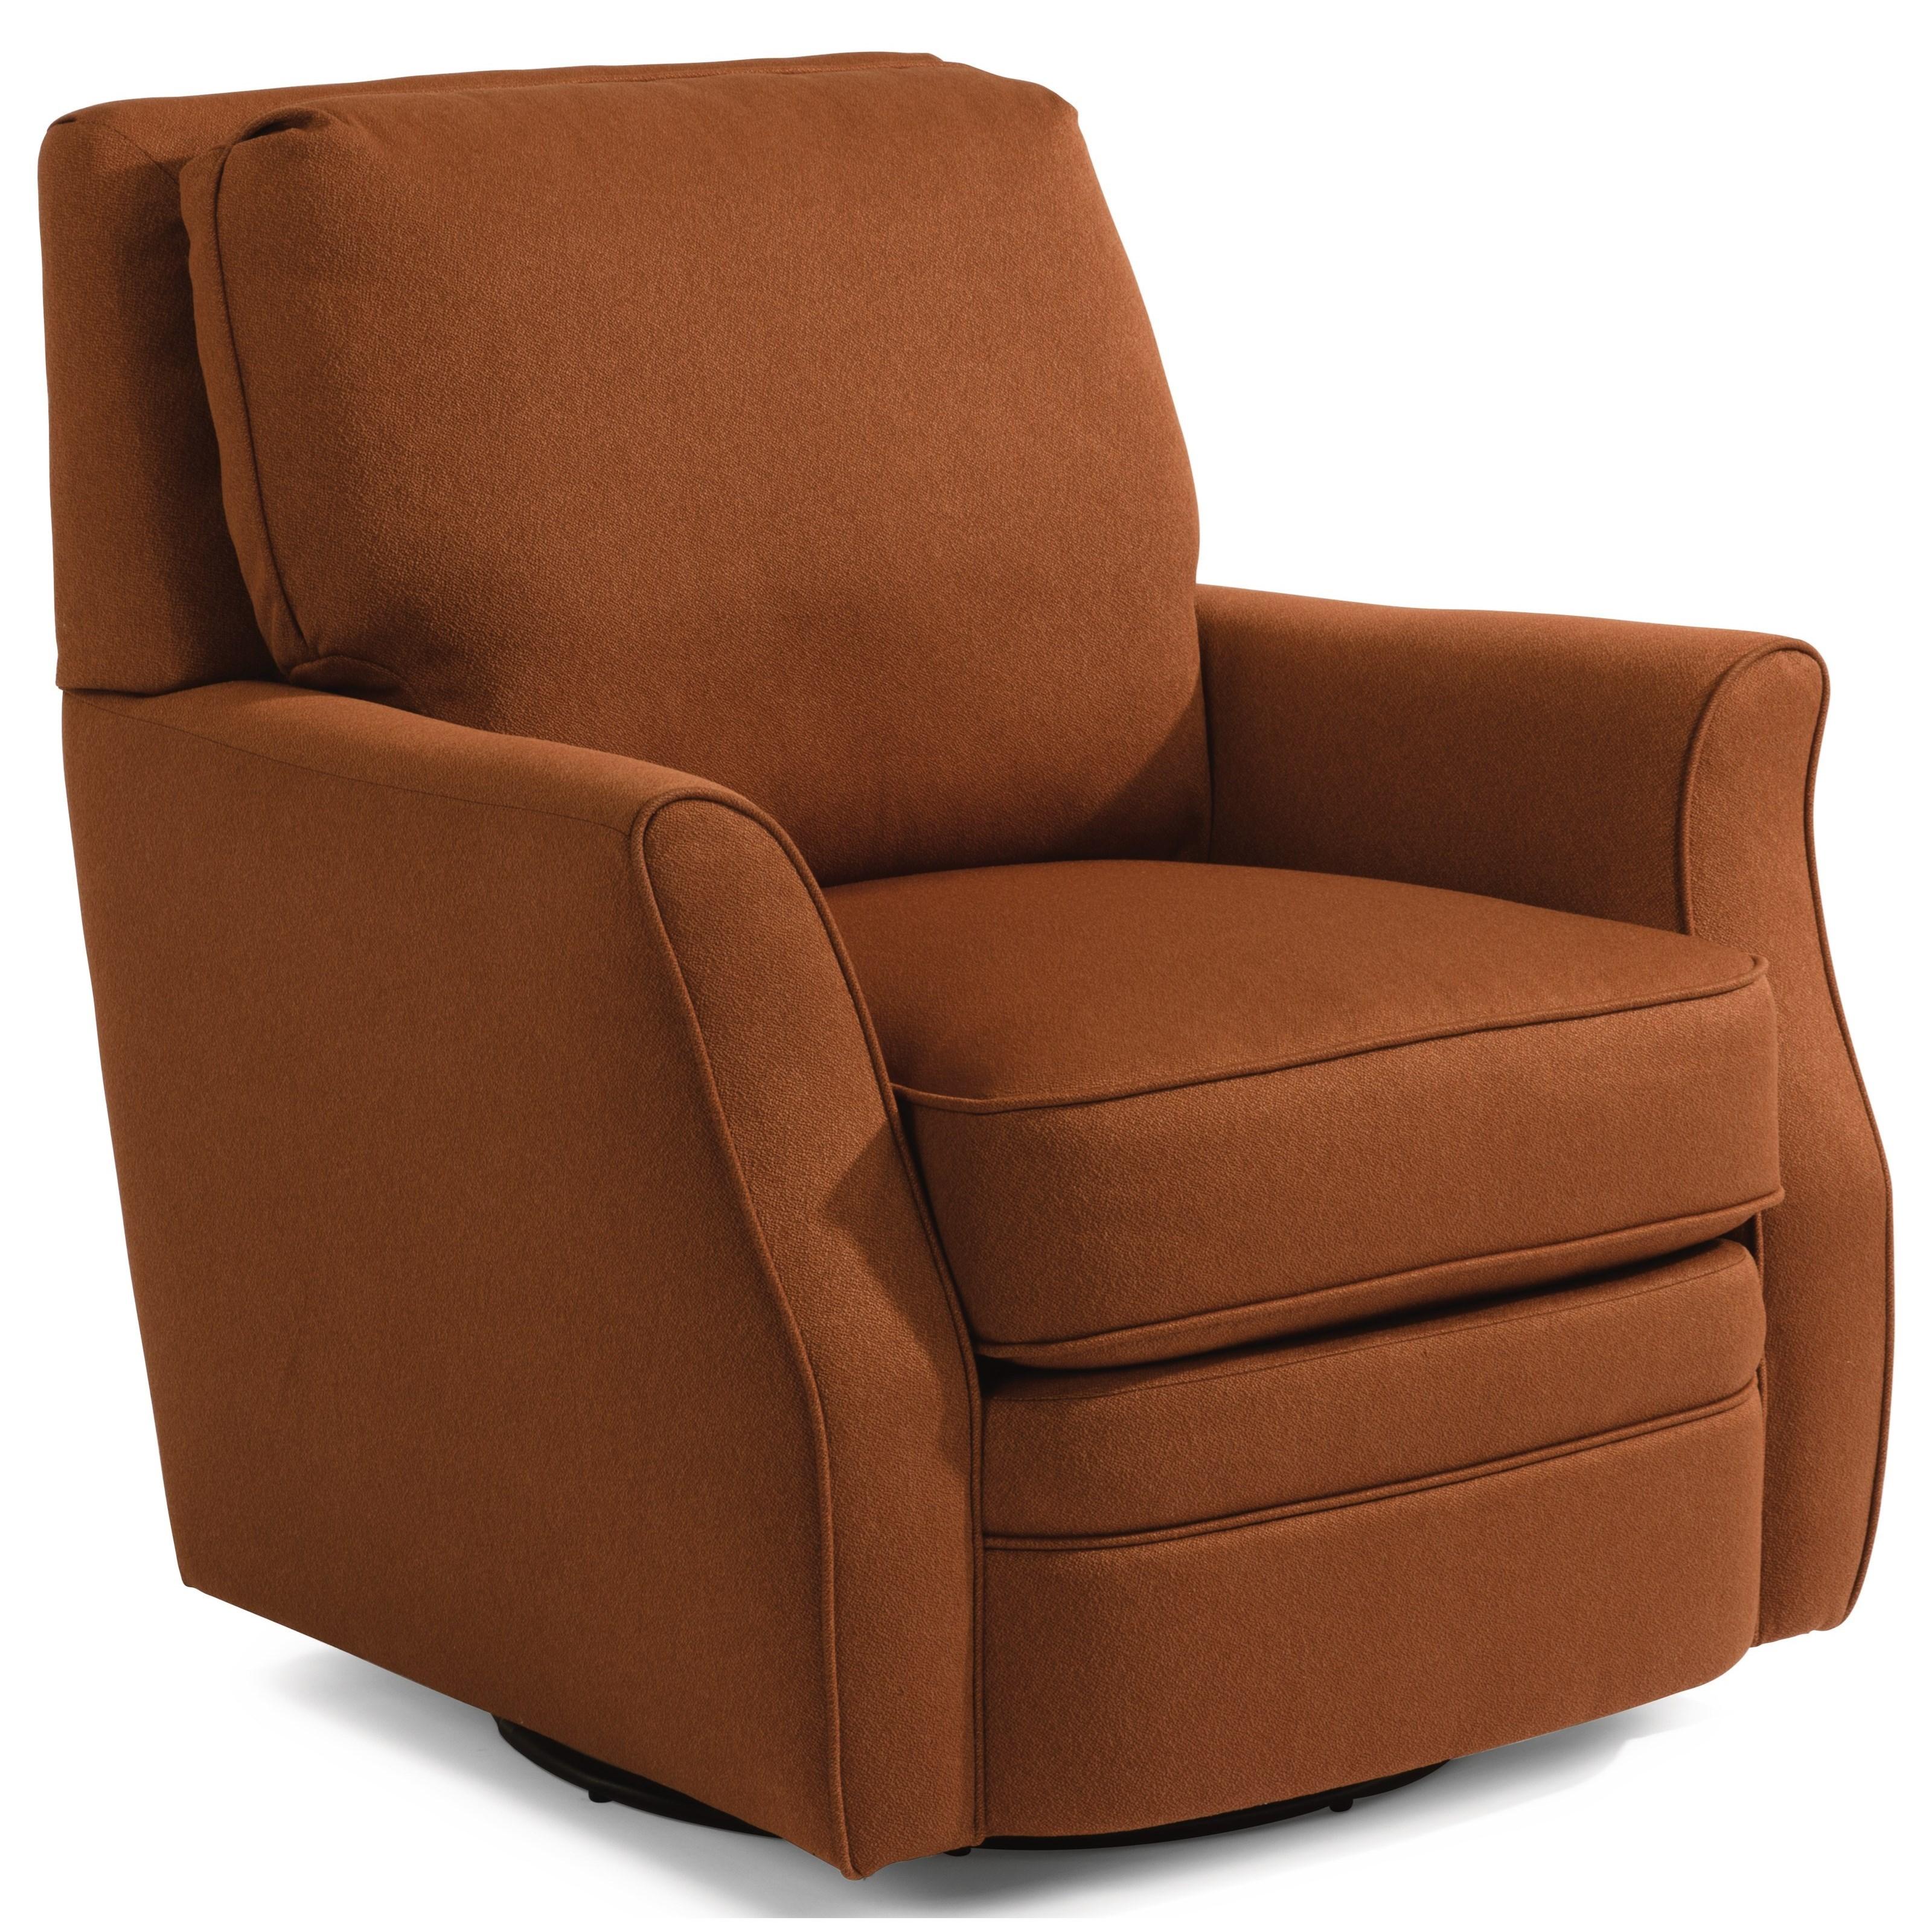 Flexsteel Brynn Casual Swivel Chair Belfort Furniture Upholstered Chairs